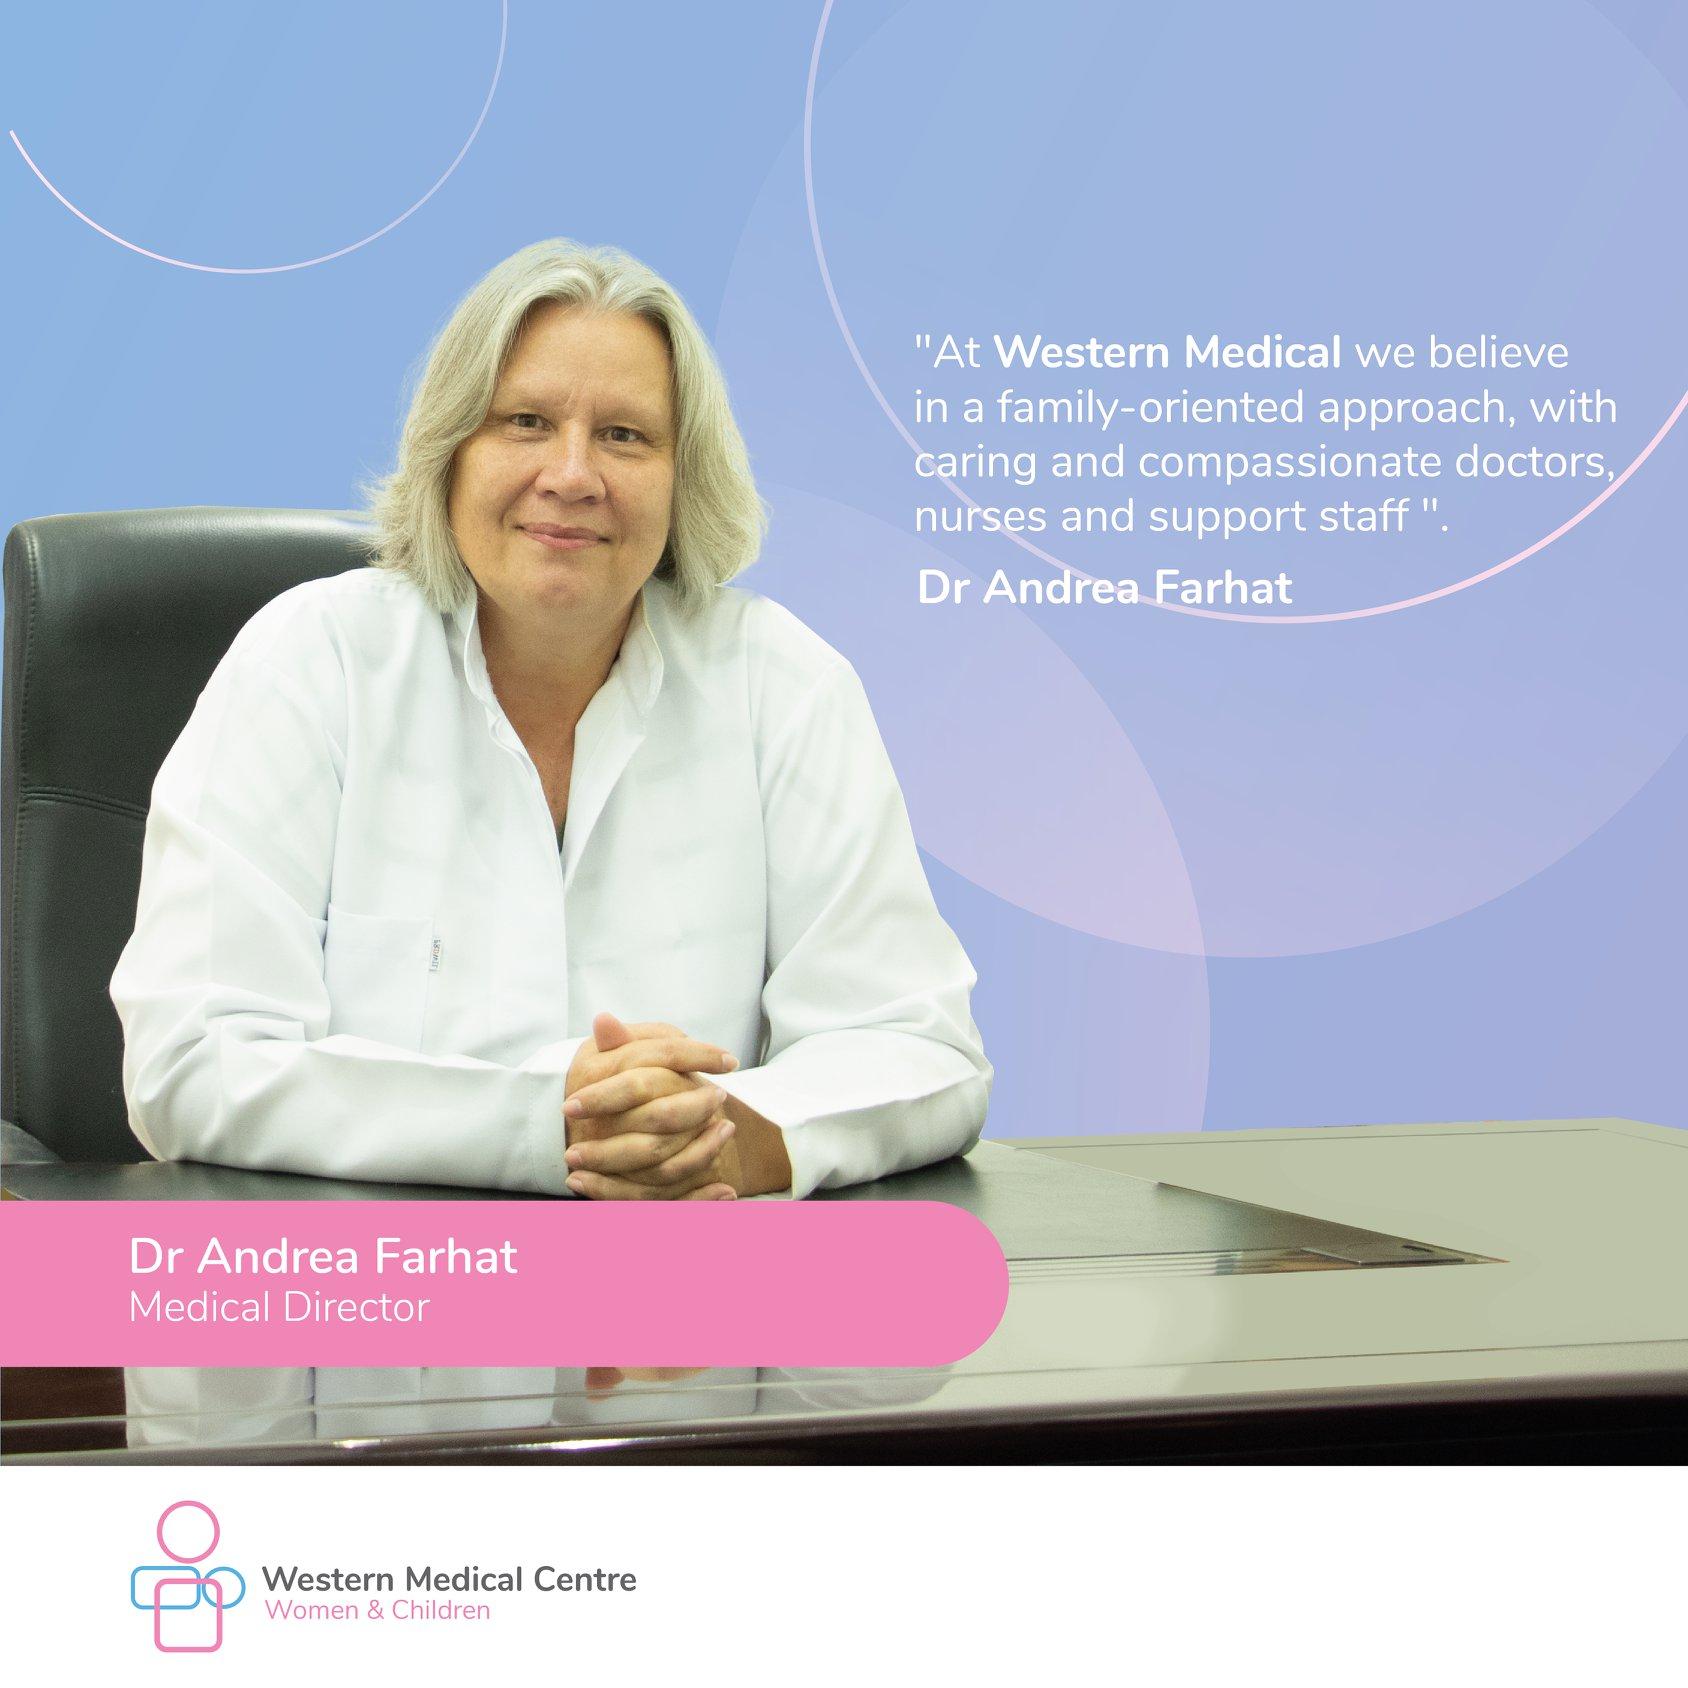 Western Medical Centre Dubai